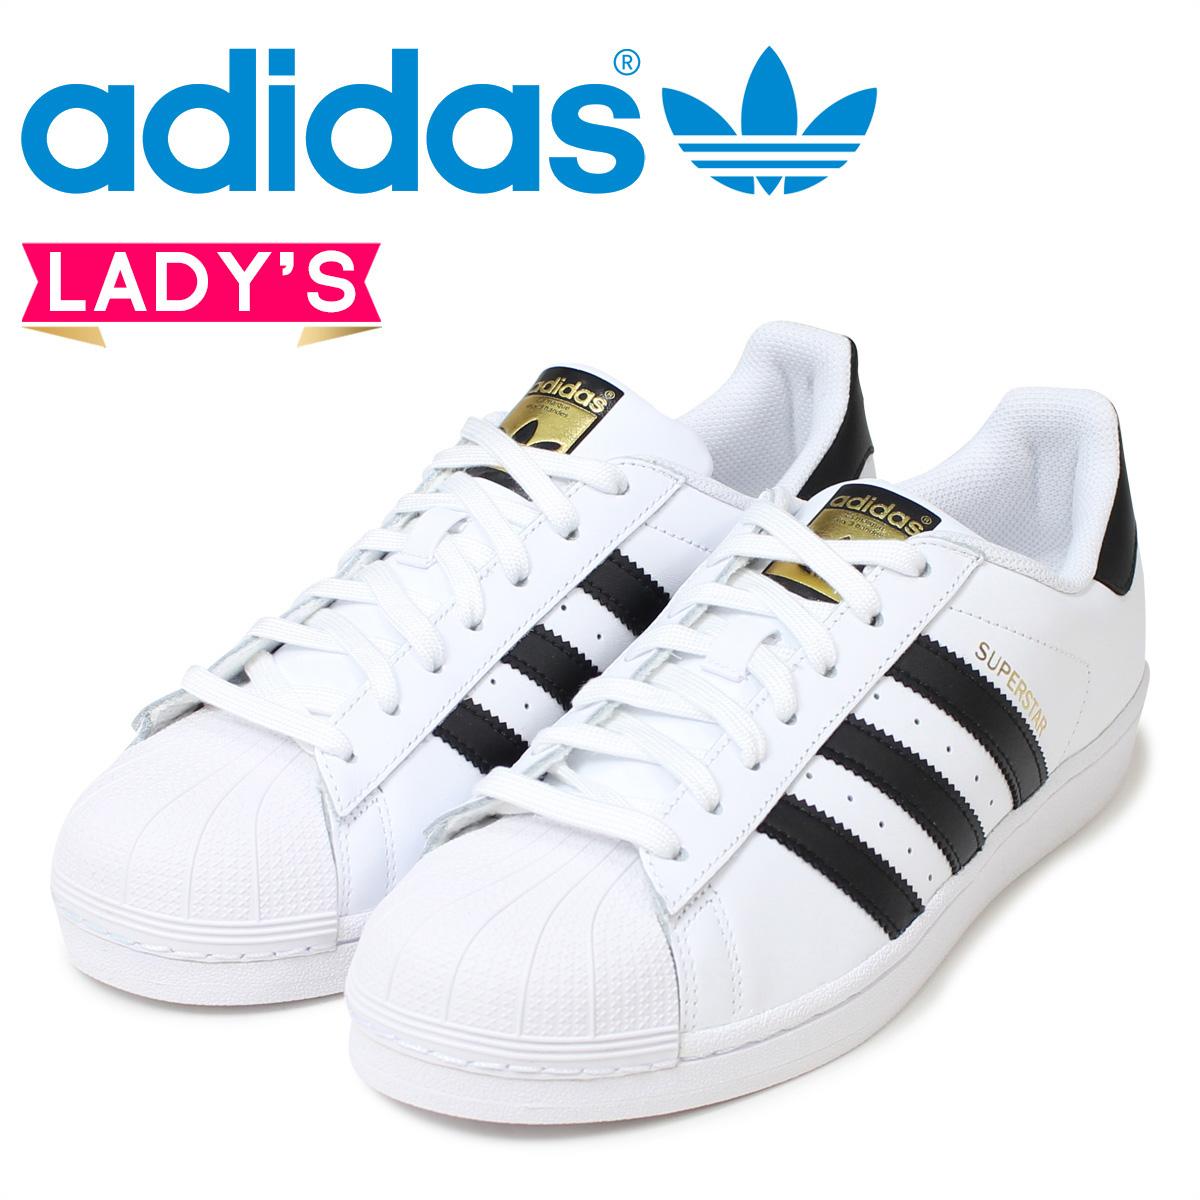 adidas Originals adidas originals superstar women sneakers Womens SUPERSTAR  W C77153 shoes white black